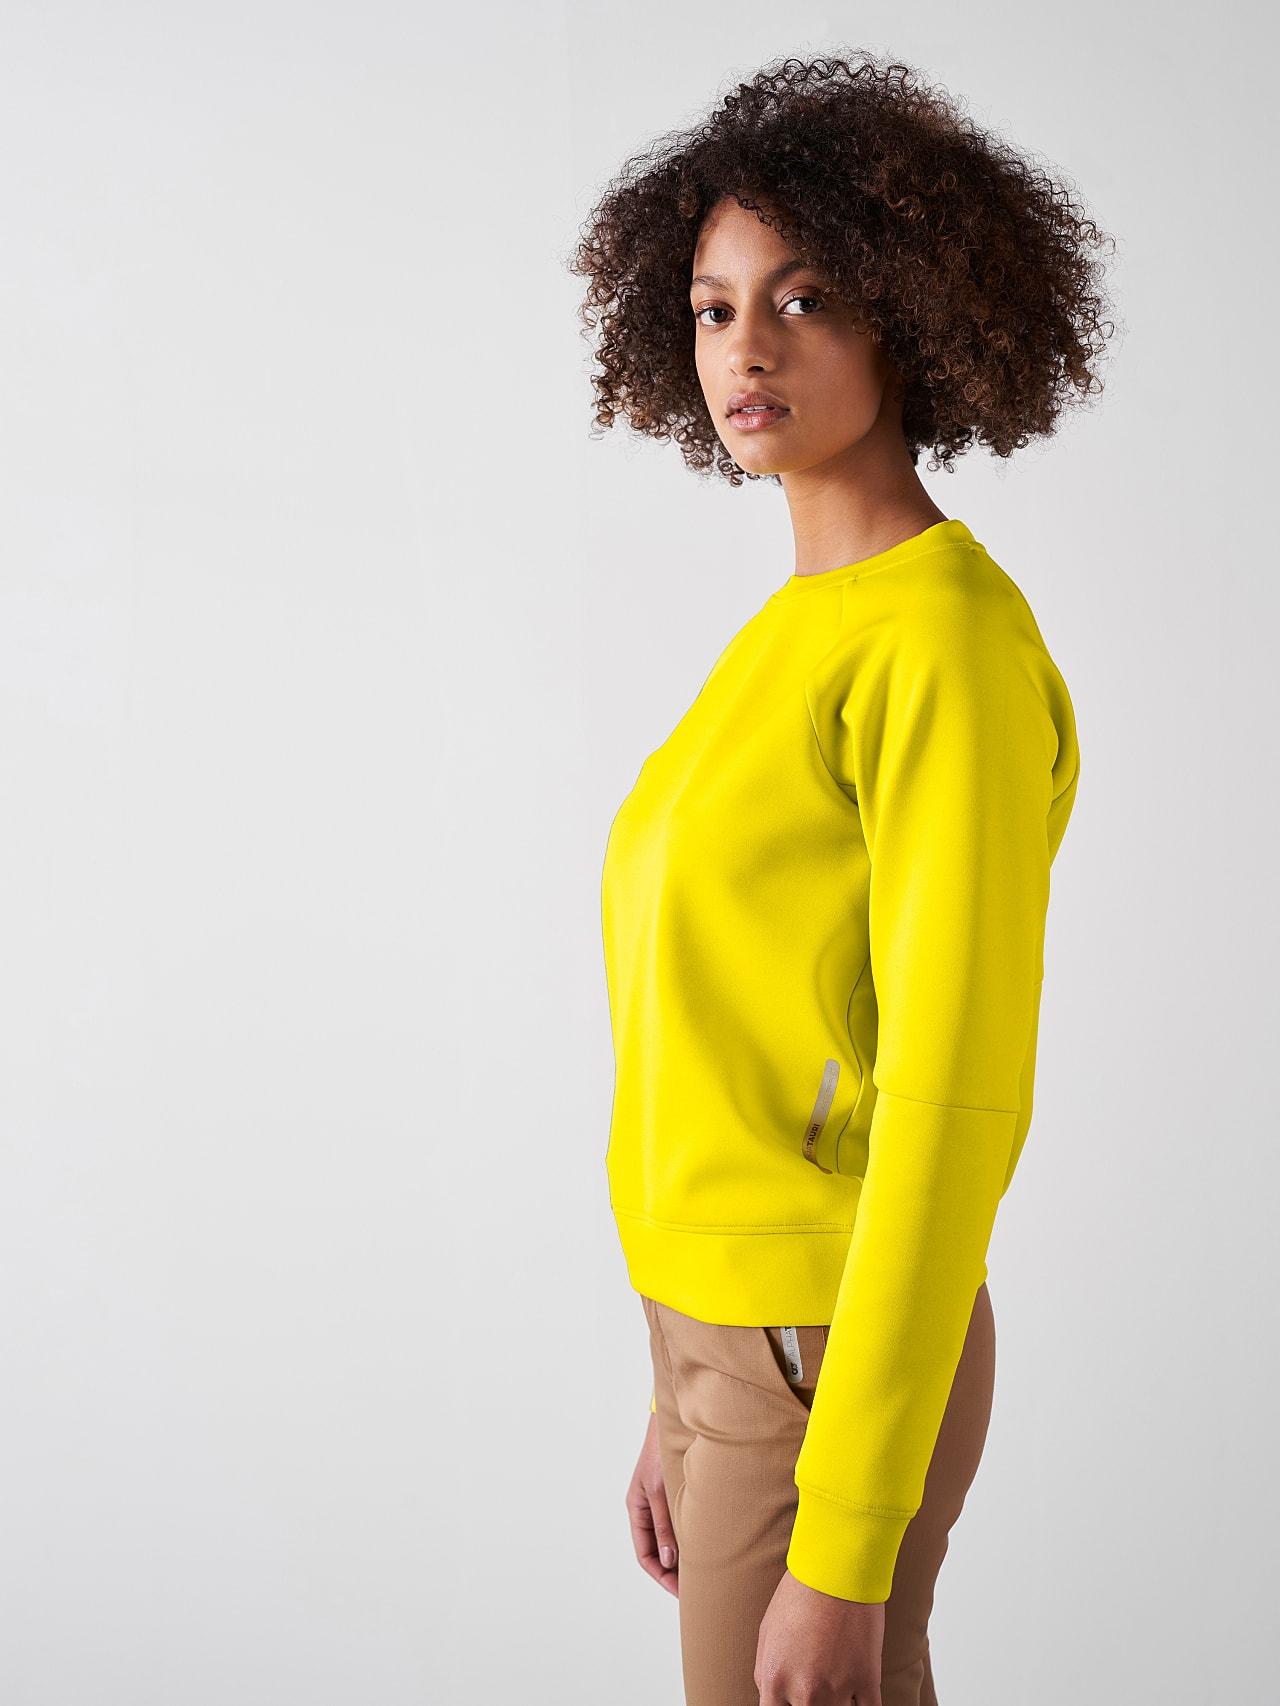 SINOV V1.Y5.01 Crewneck Sweater yellow Model shot Alpha Tauri